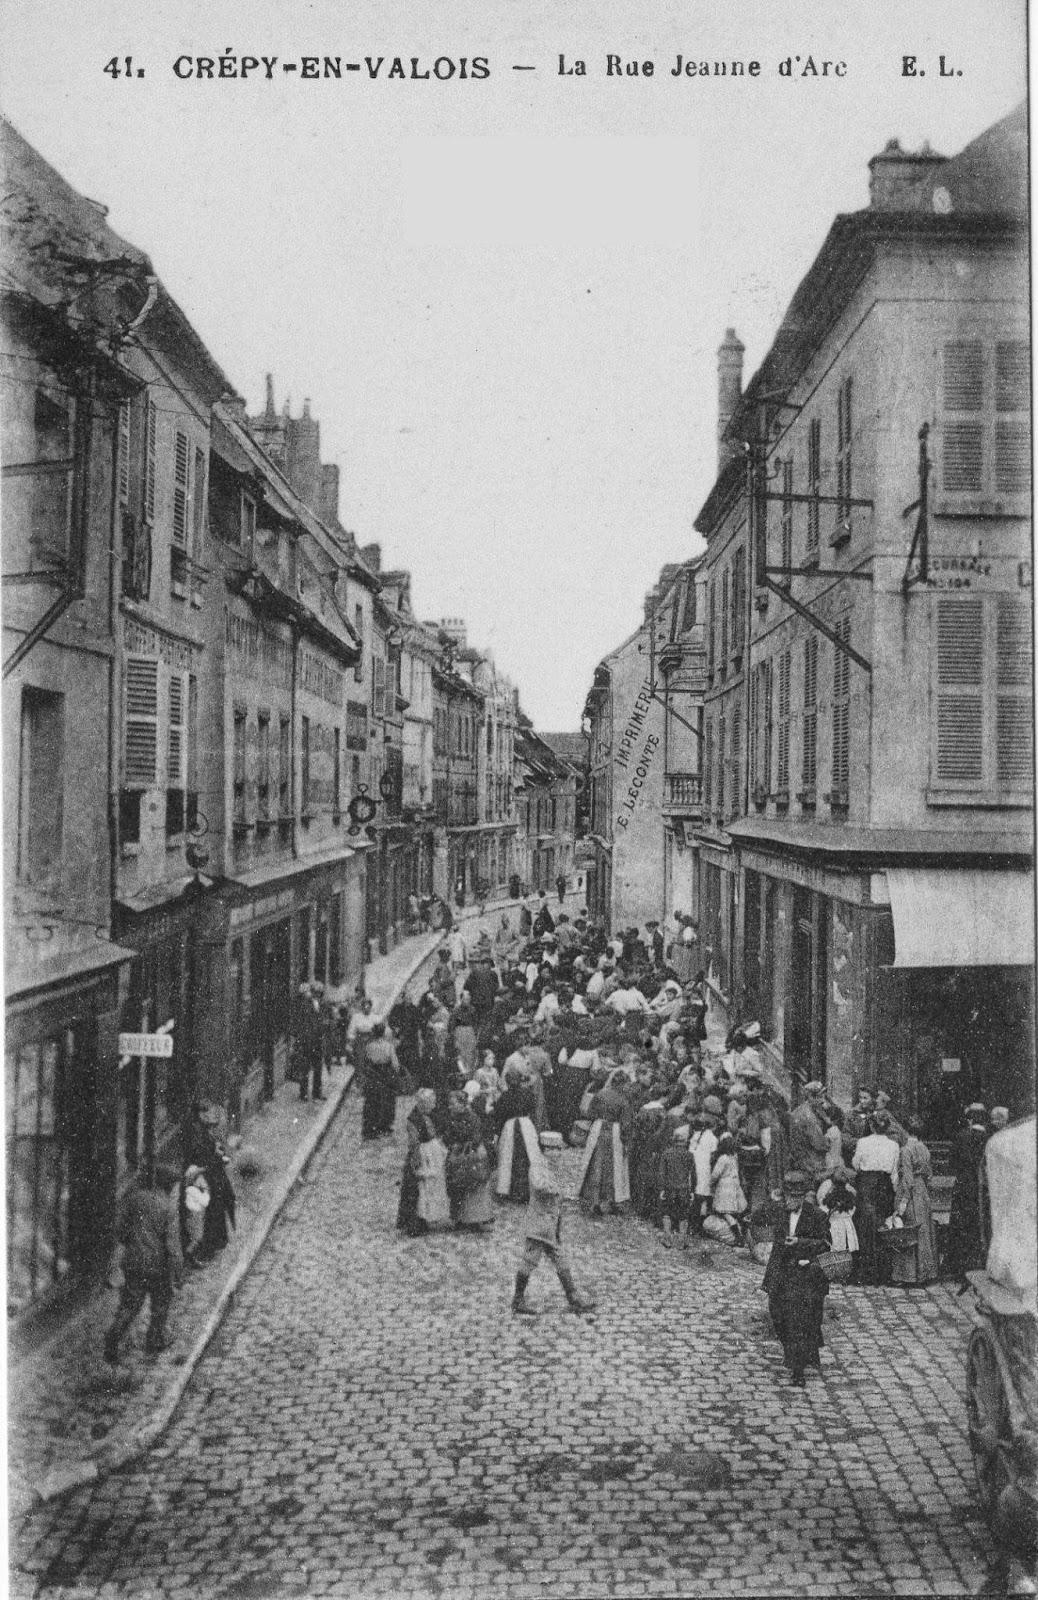 Cr py en valois en 1914 m moires du valois for Garage crepy en valois